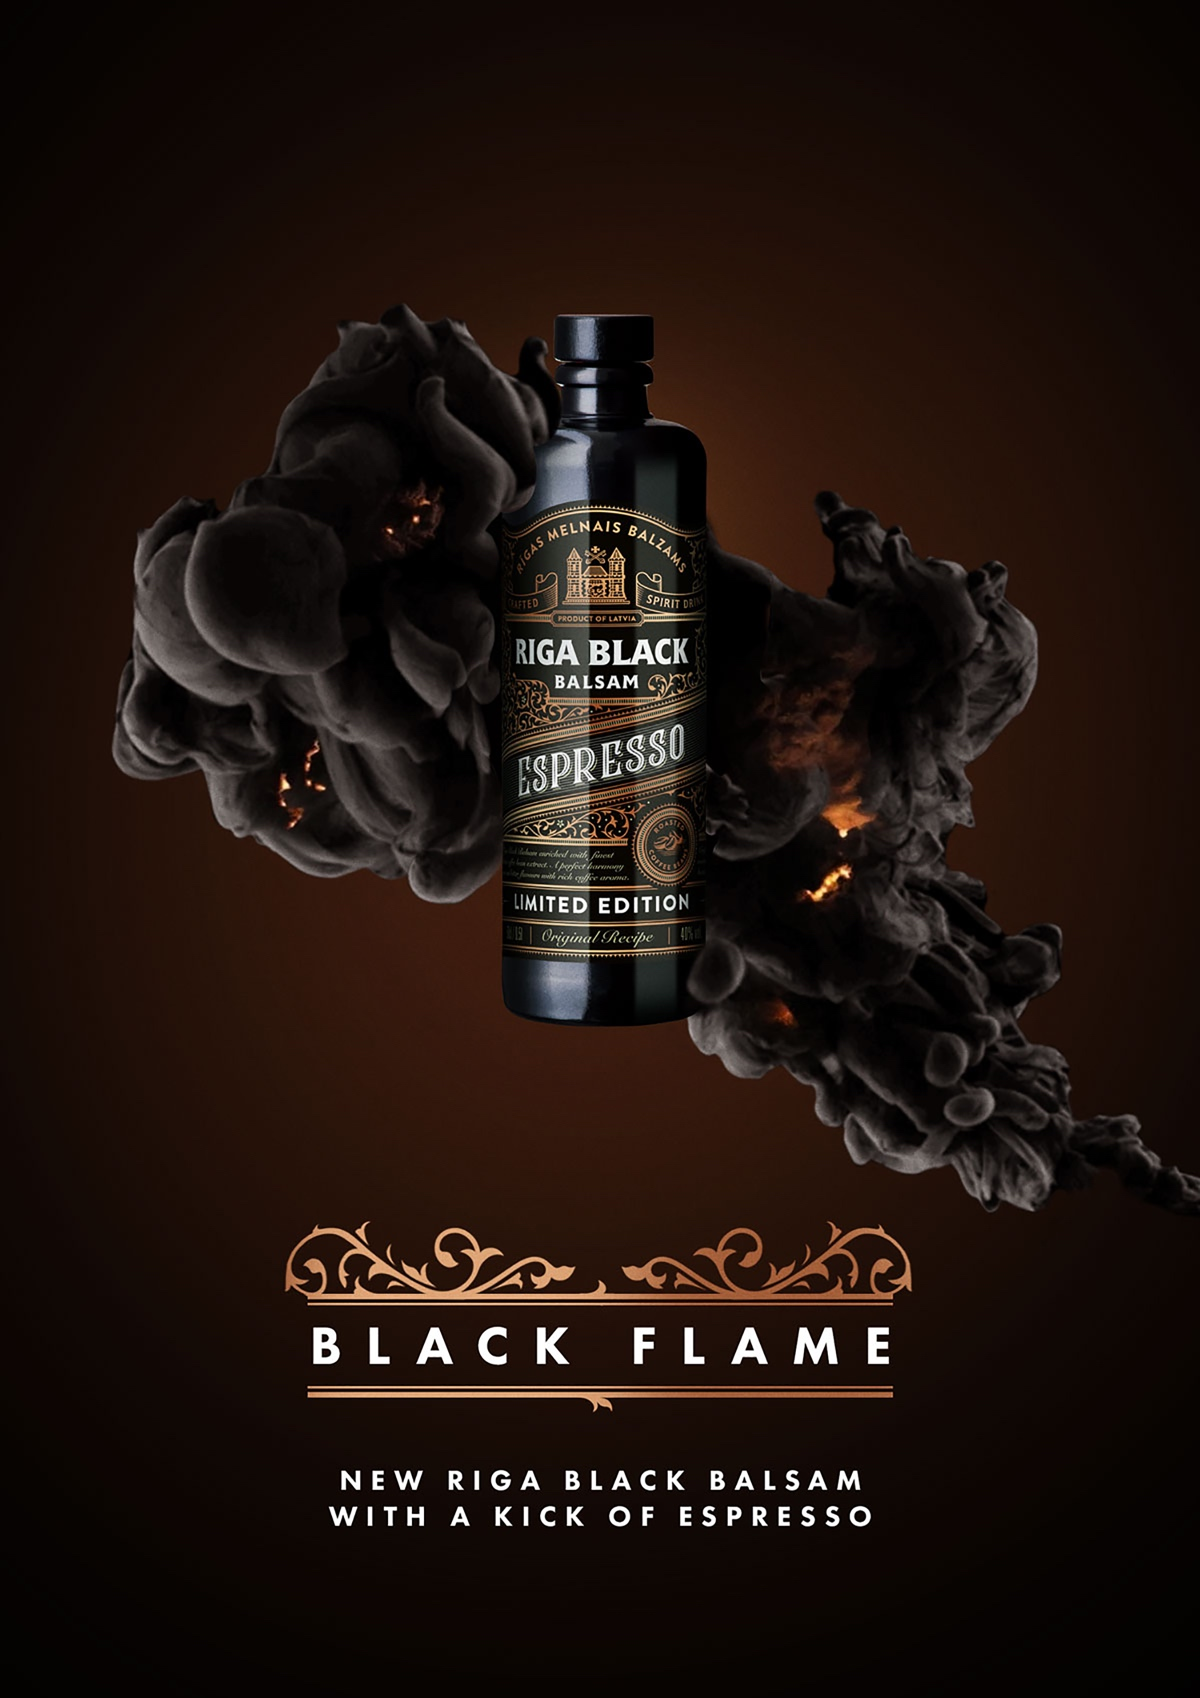 riga_black_balsam_-_black_flame